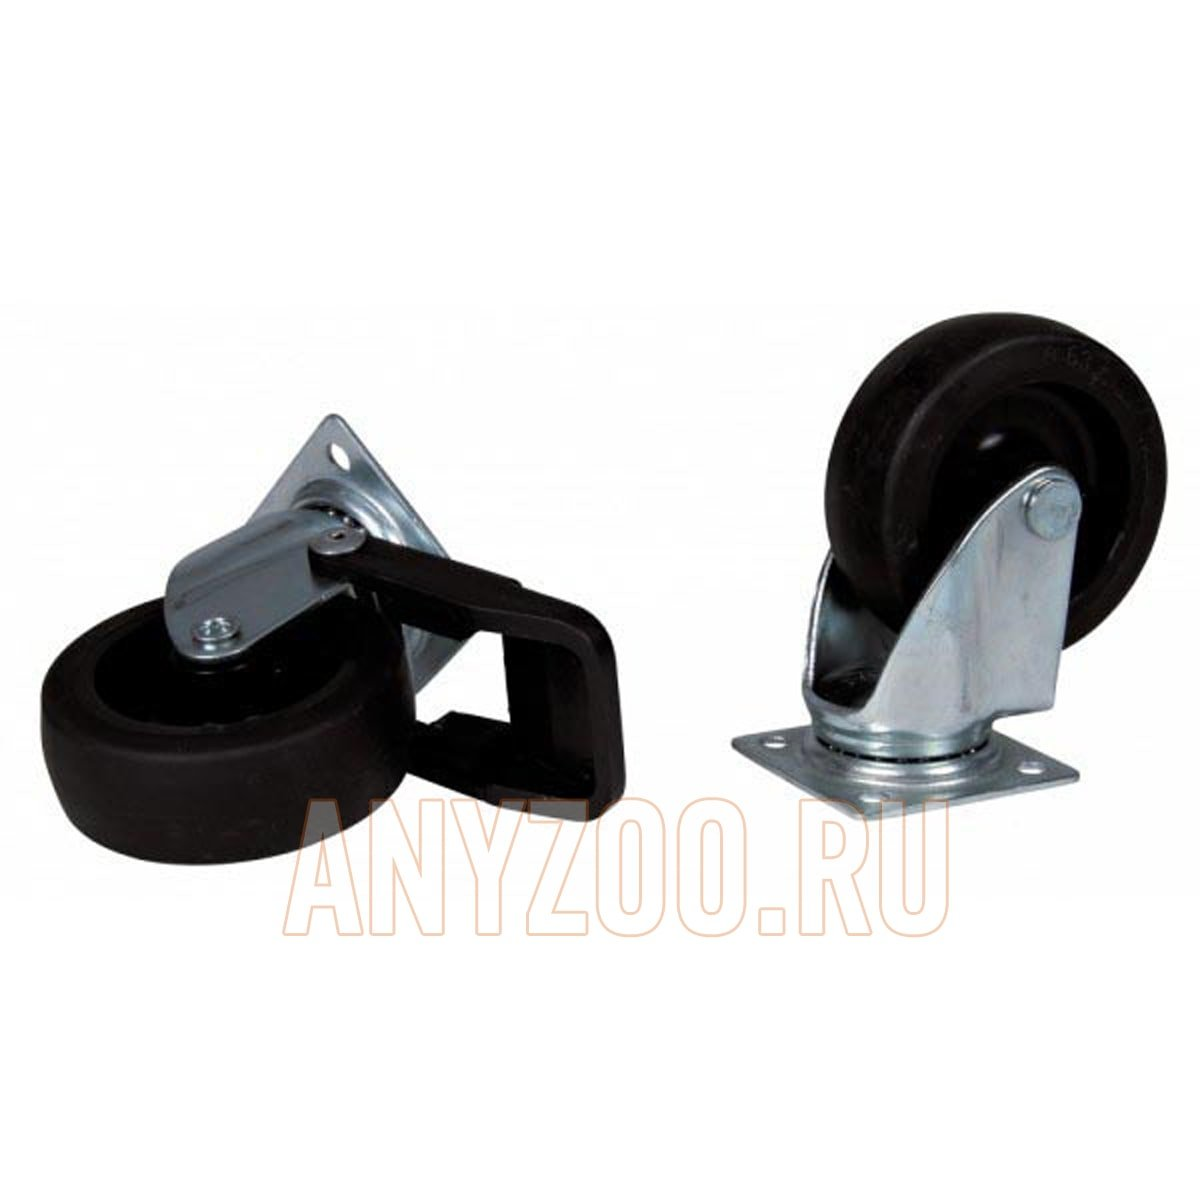 Trixie Трикси колесики для переносок Gulliver 4-7 и Gulliver Touring 58х60х79см ( Аксессуары для перевозки )